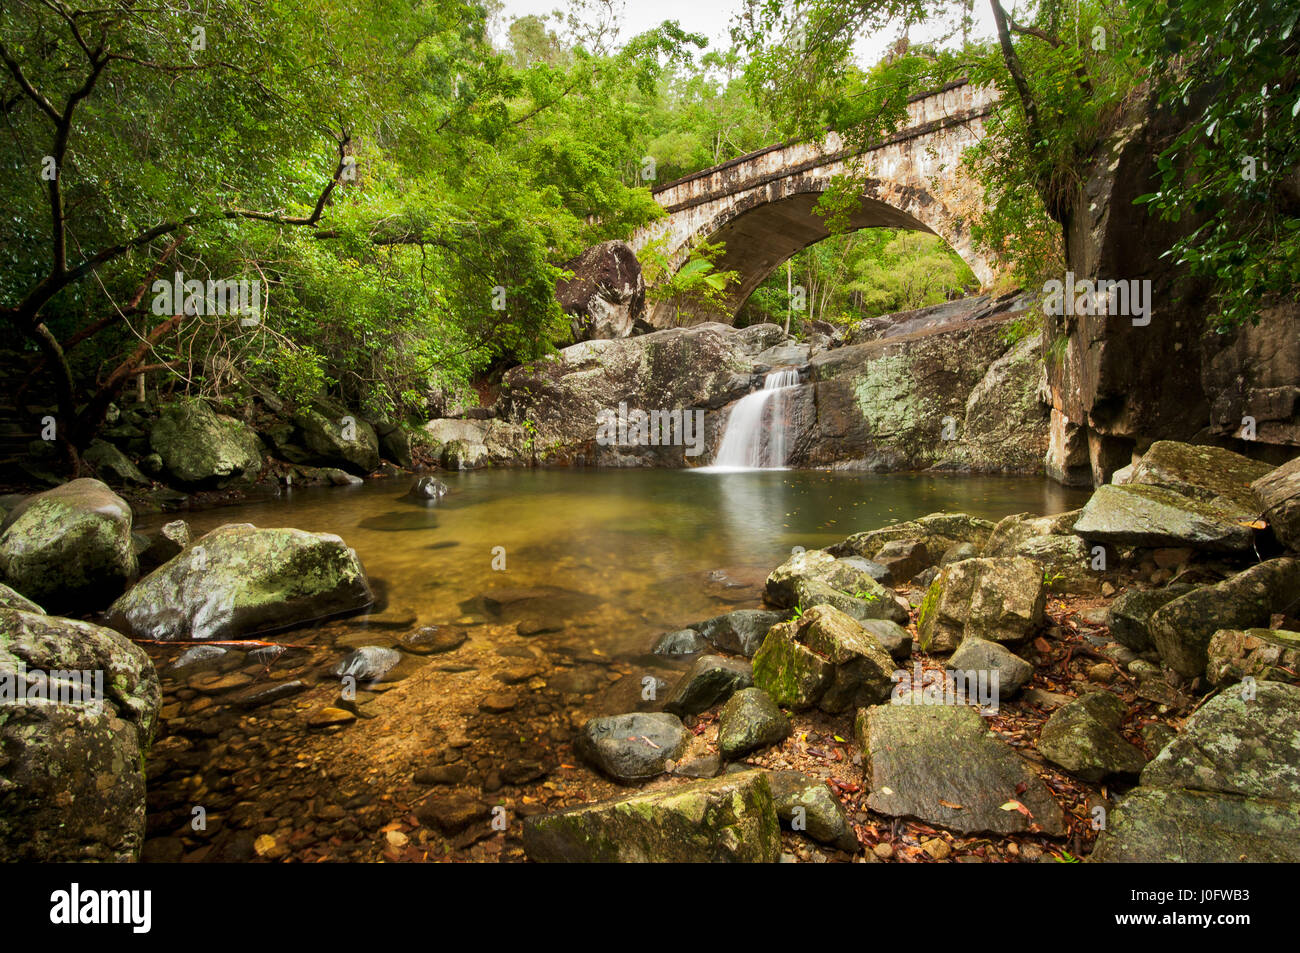 Kleine Kristall-Creek-Brücke im Bereich Paluma. Stockbild